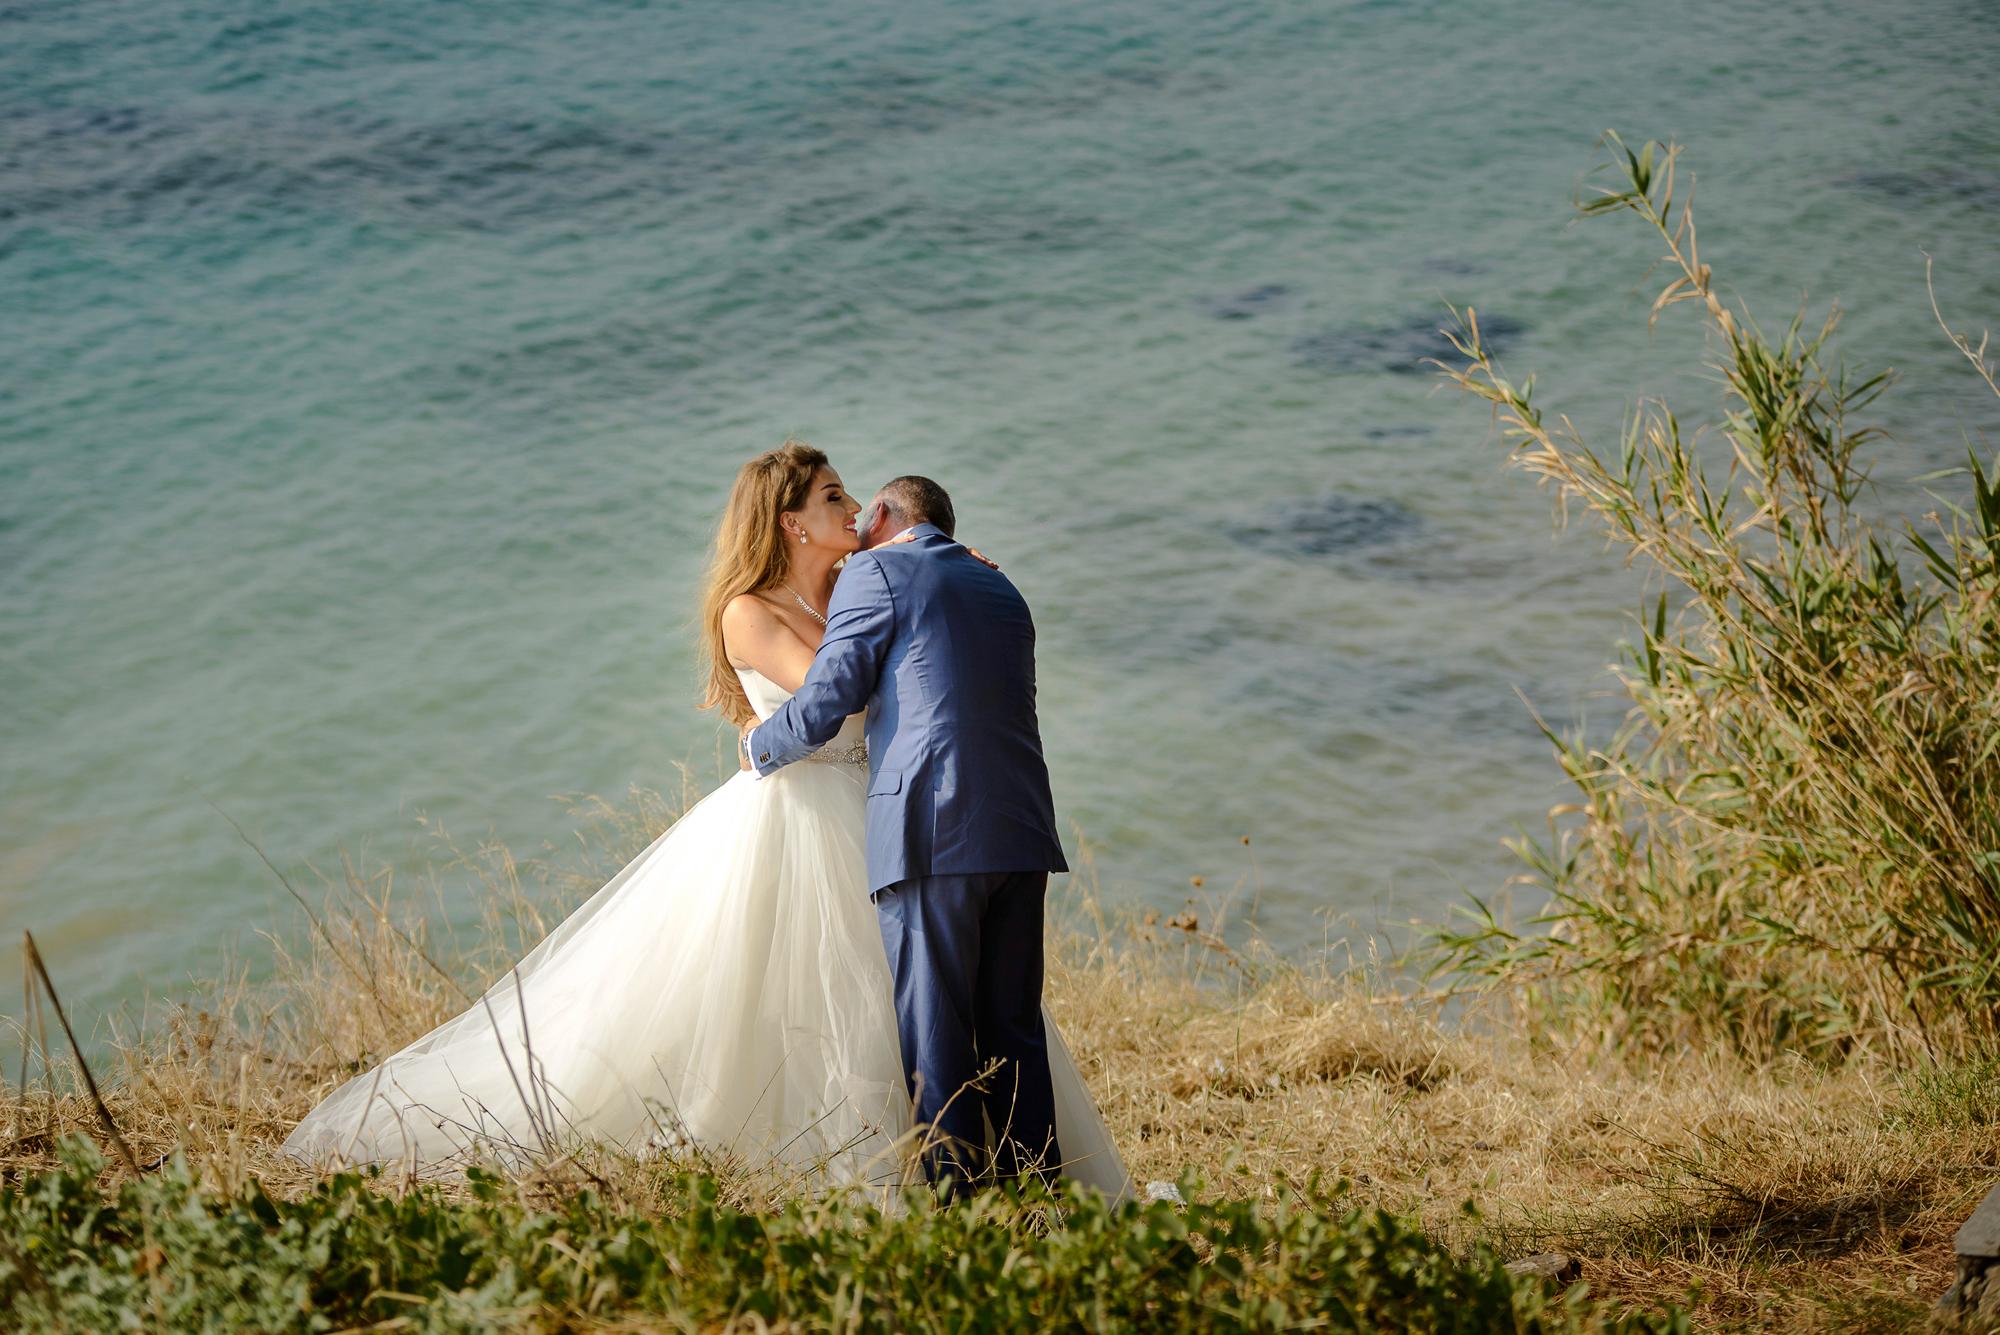 Fotografie de nunta in Grecia cu Razvan si Andreea